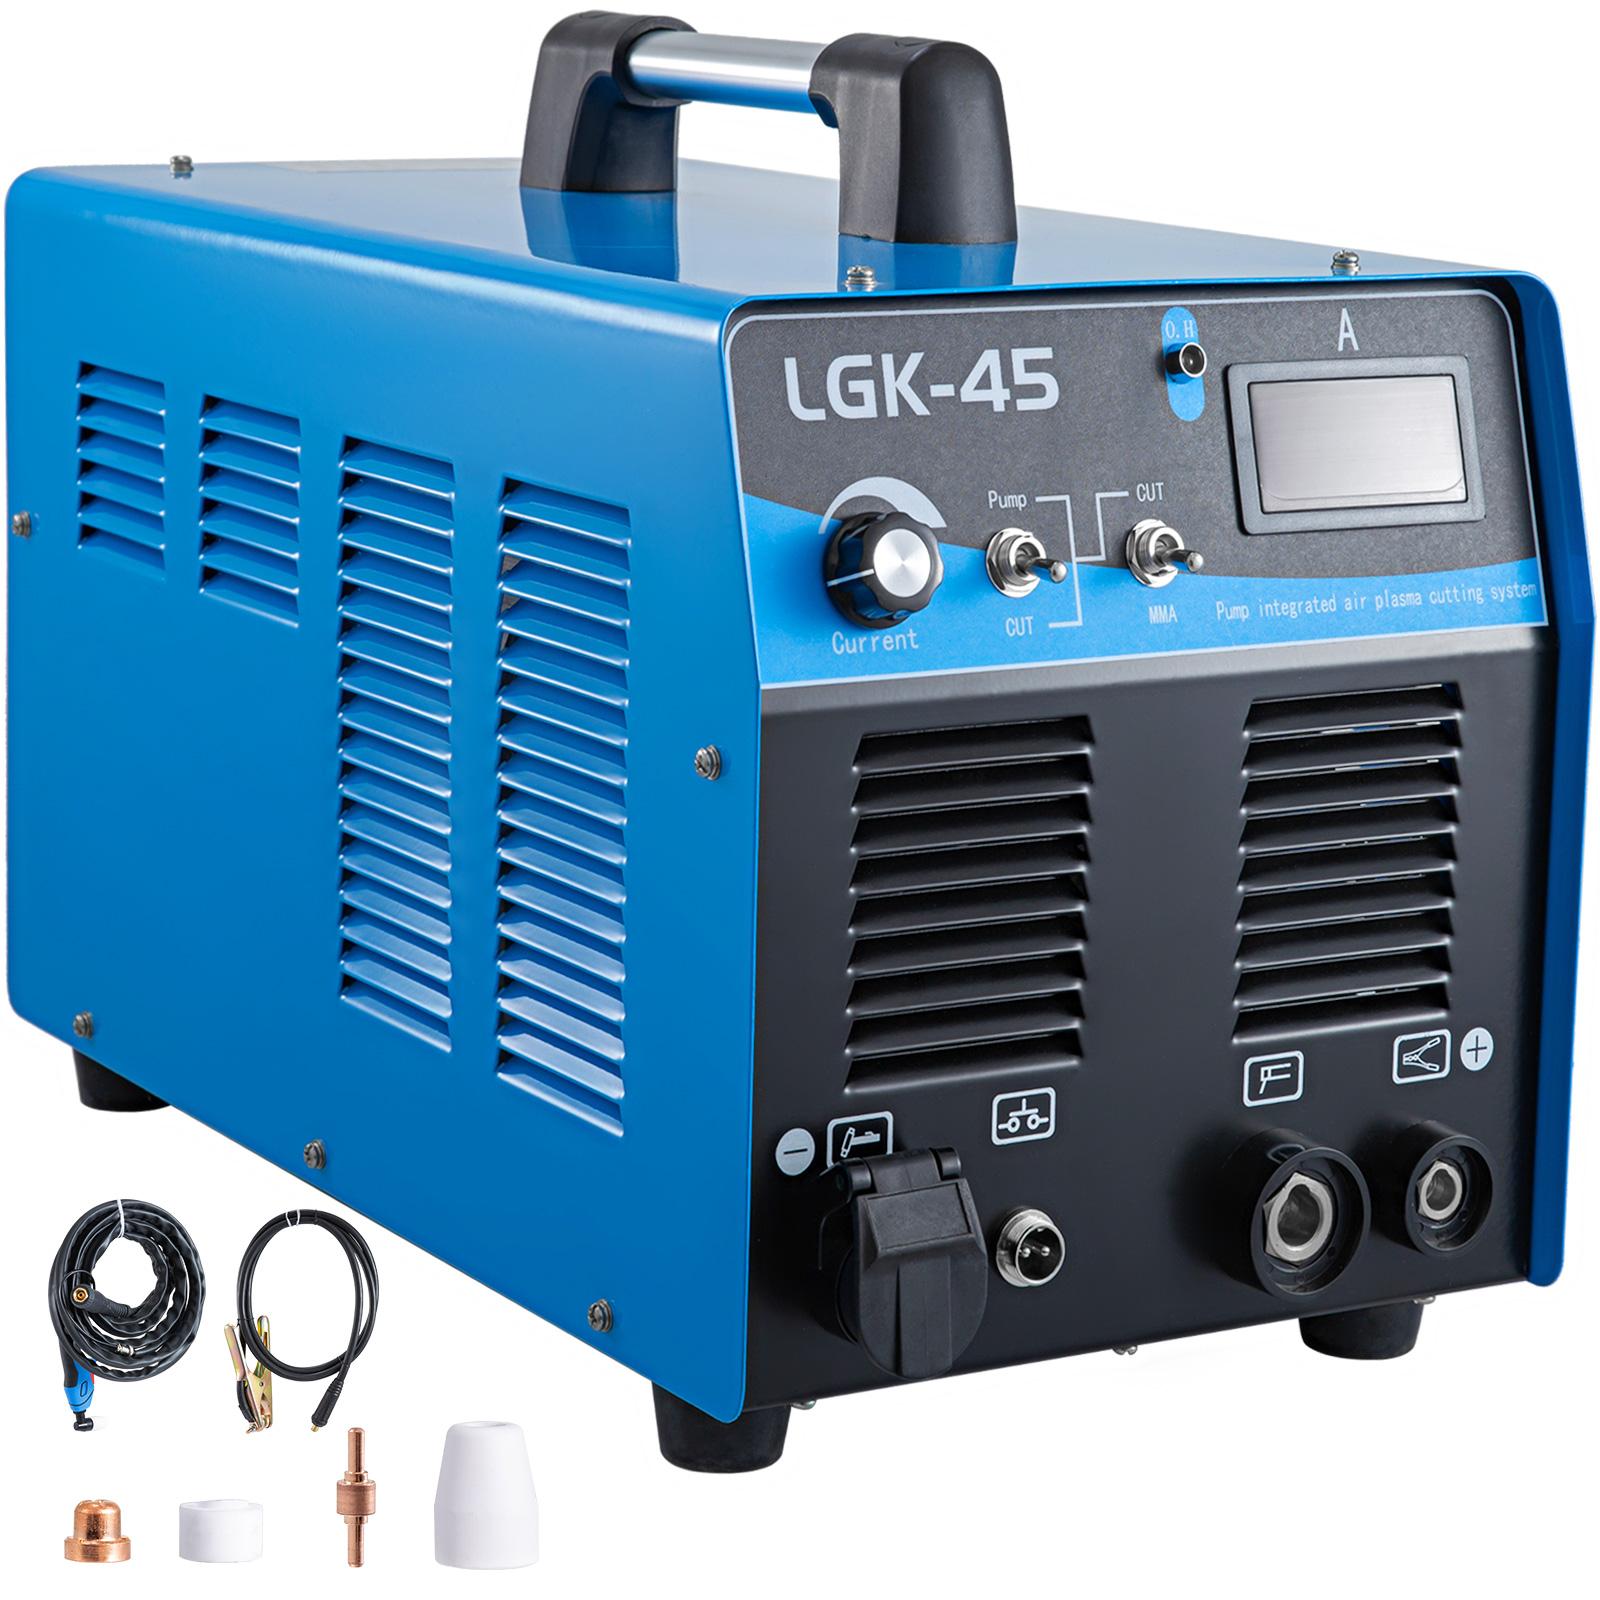 40-85A-Plasma-Cutter-Built-In-Air-Compressor-Inverter-Cutting-Machine-Cut-35mm thumbnail 25